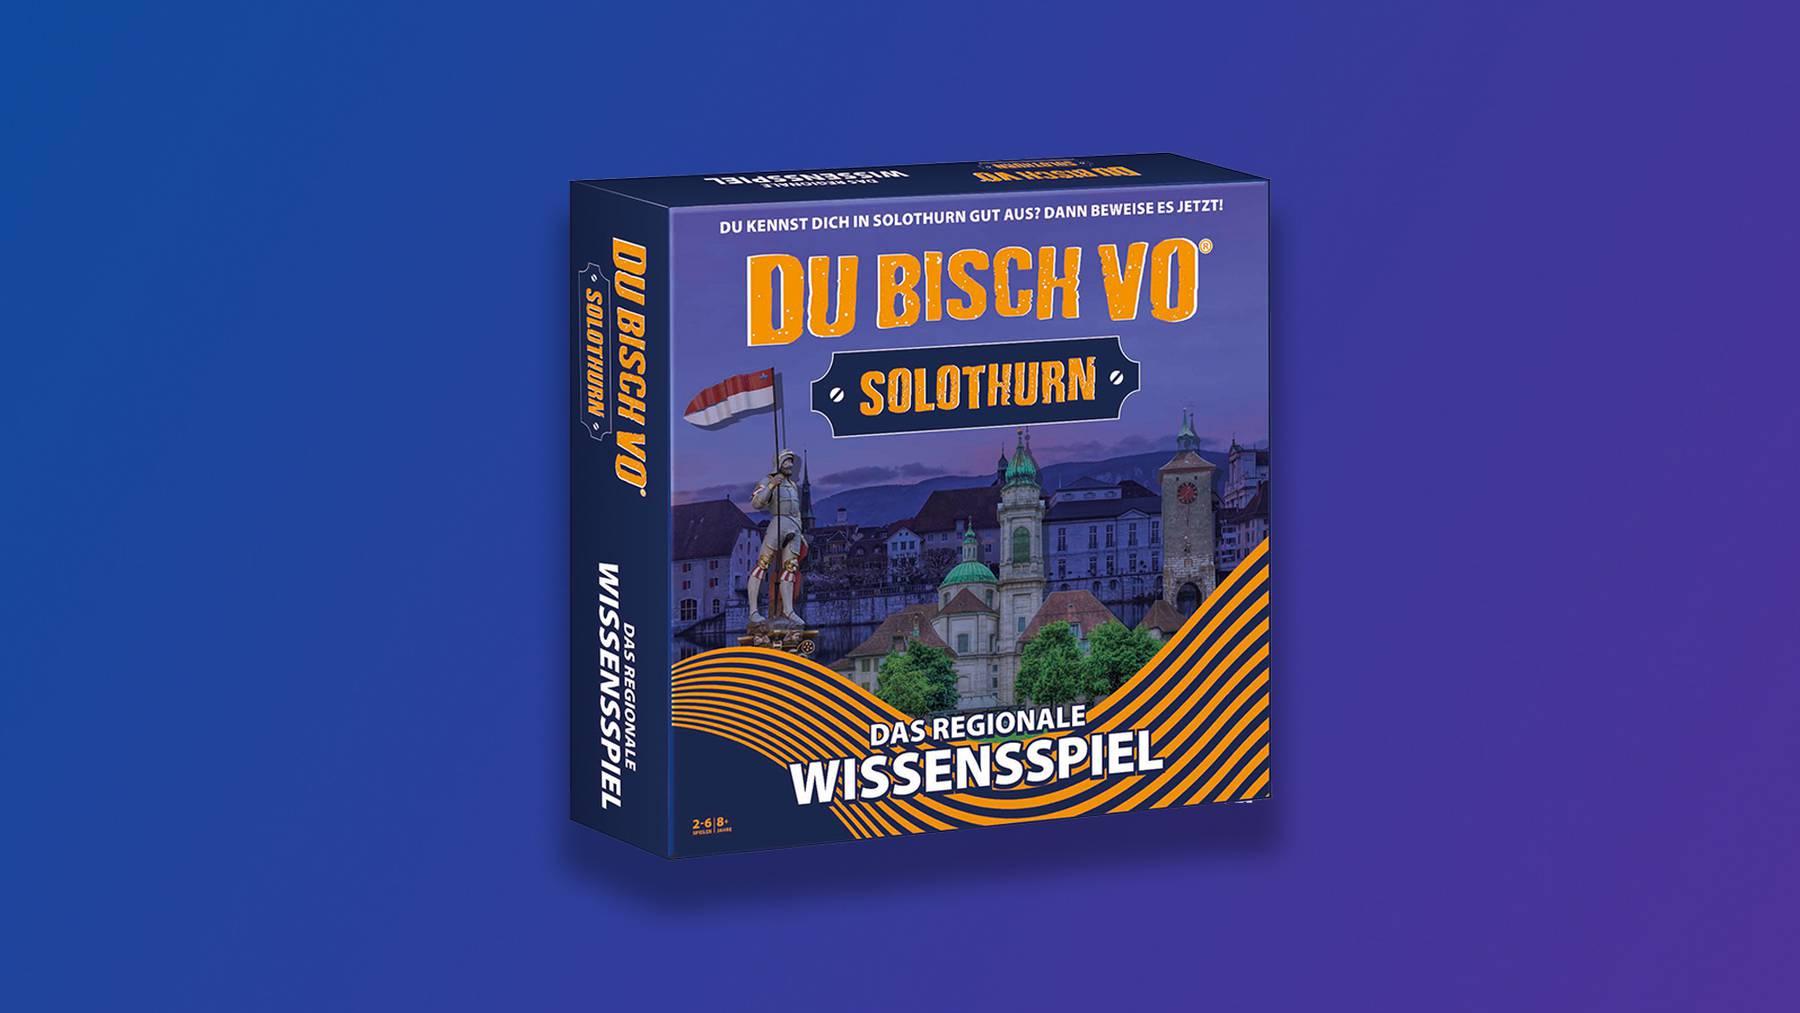 Mockup Du Bisch Vo Solothurn 2021